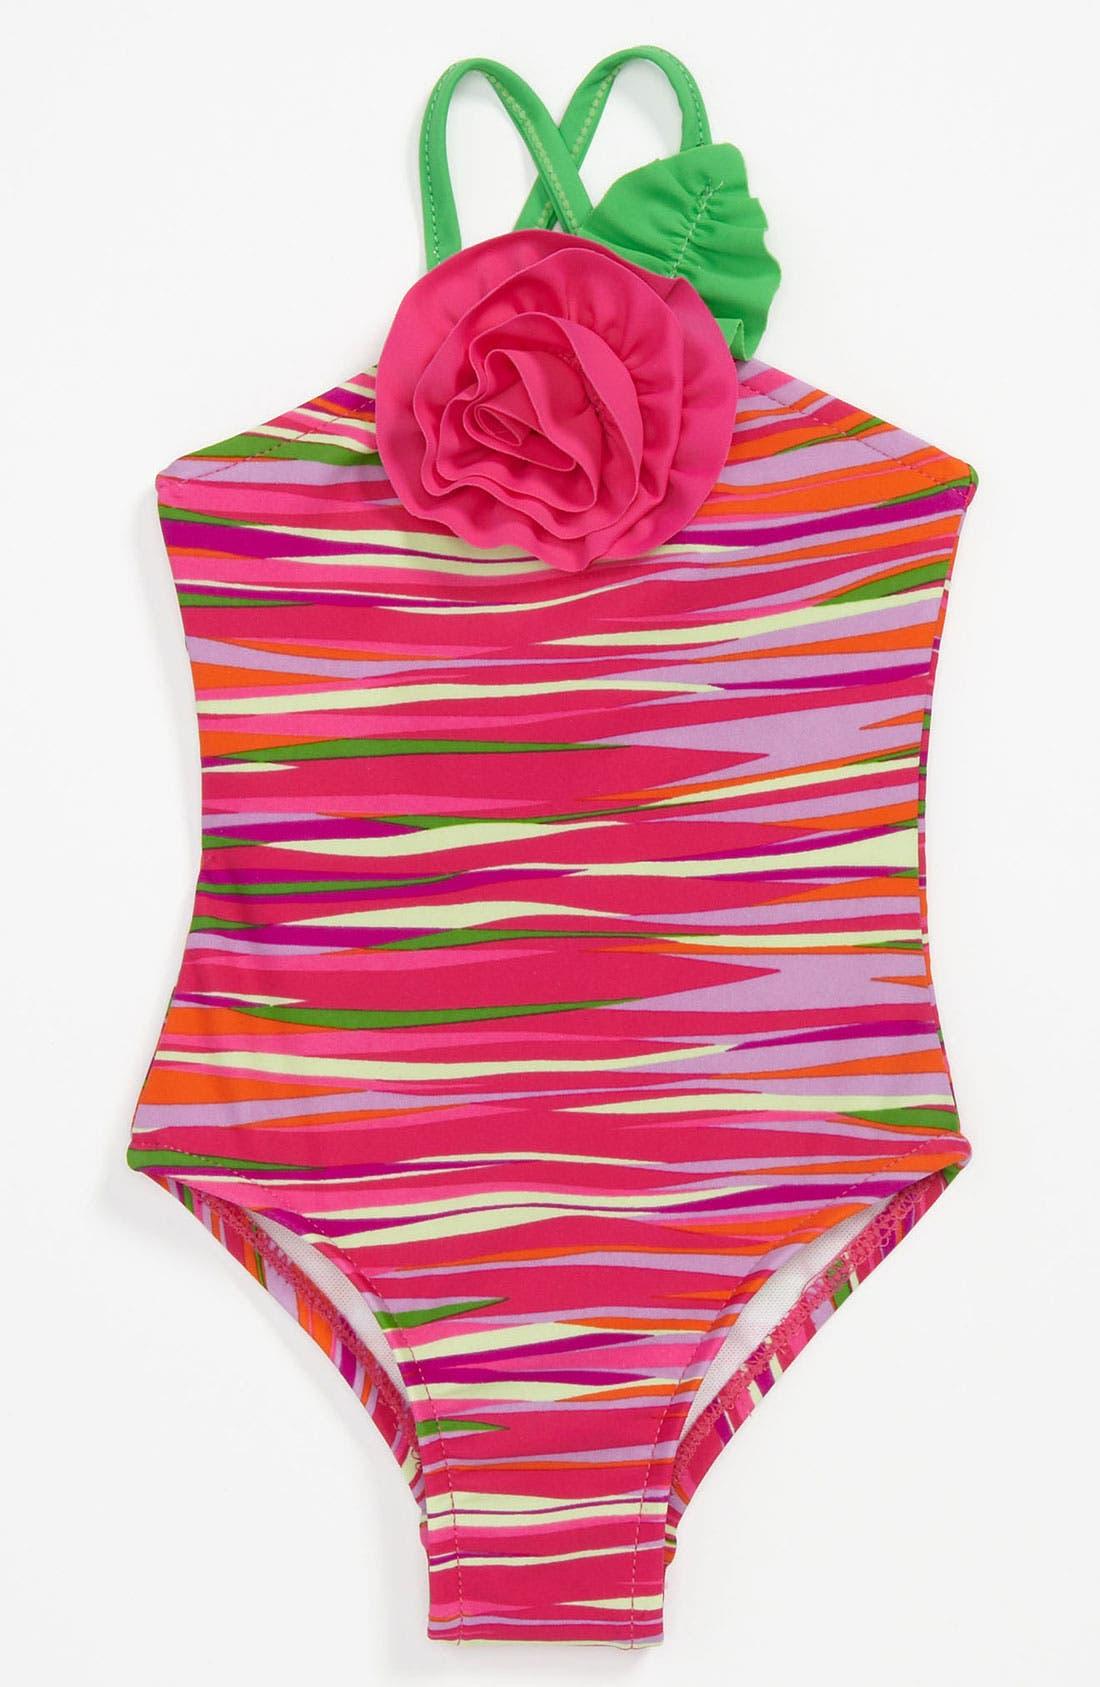 Main Image - Love U Lots One Piece Swimsuit (Baby)